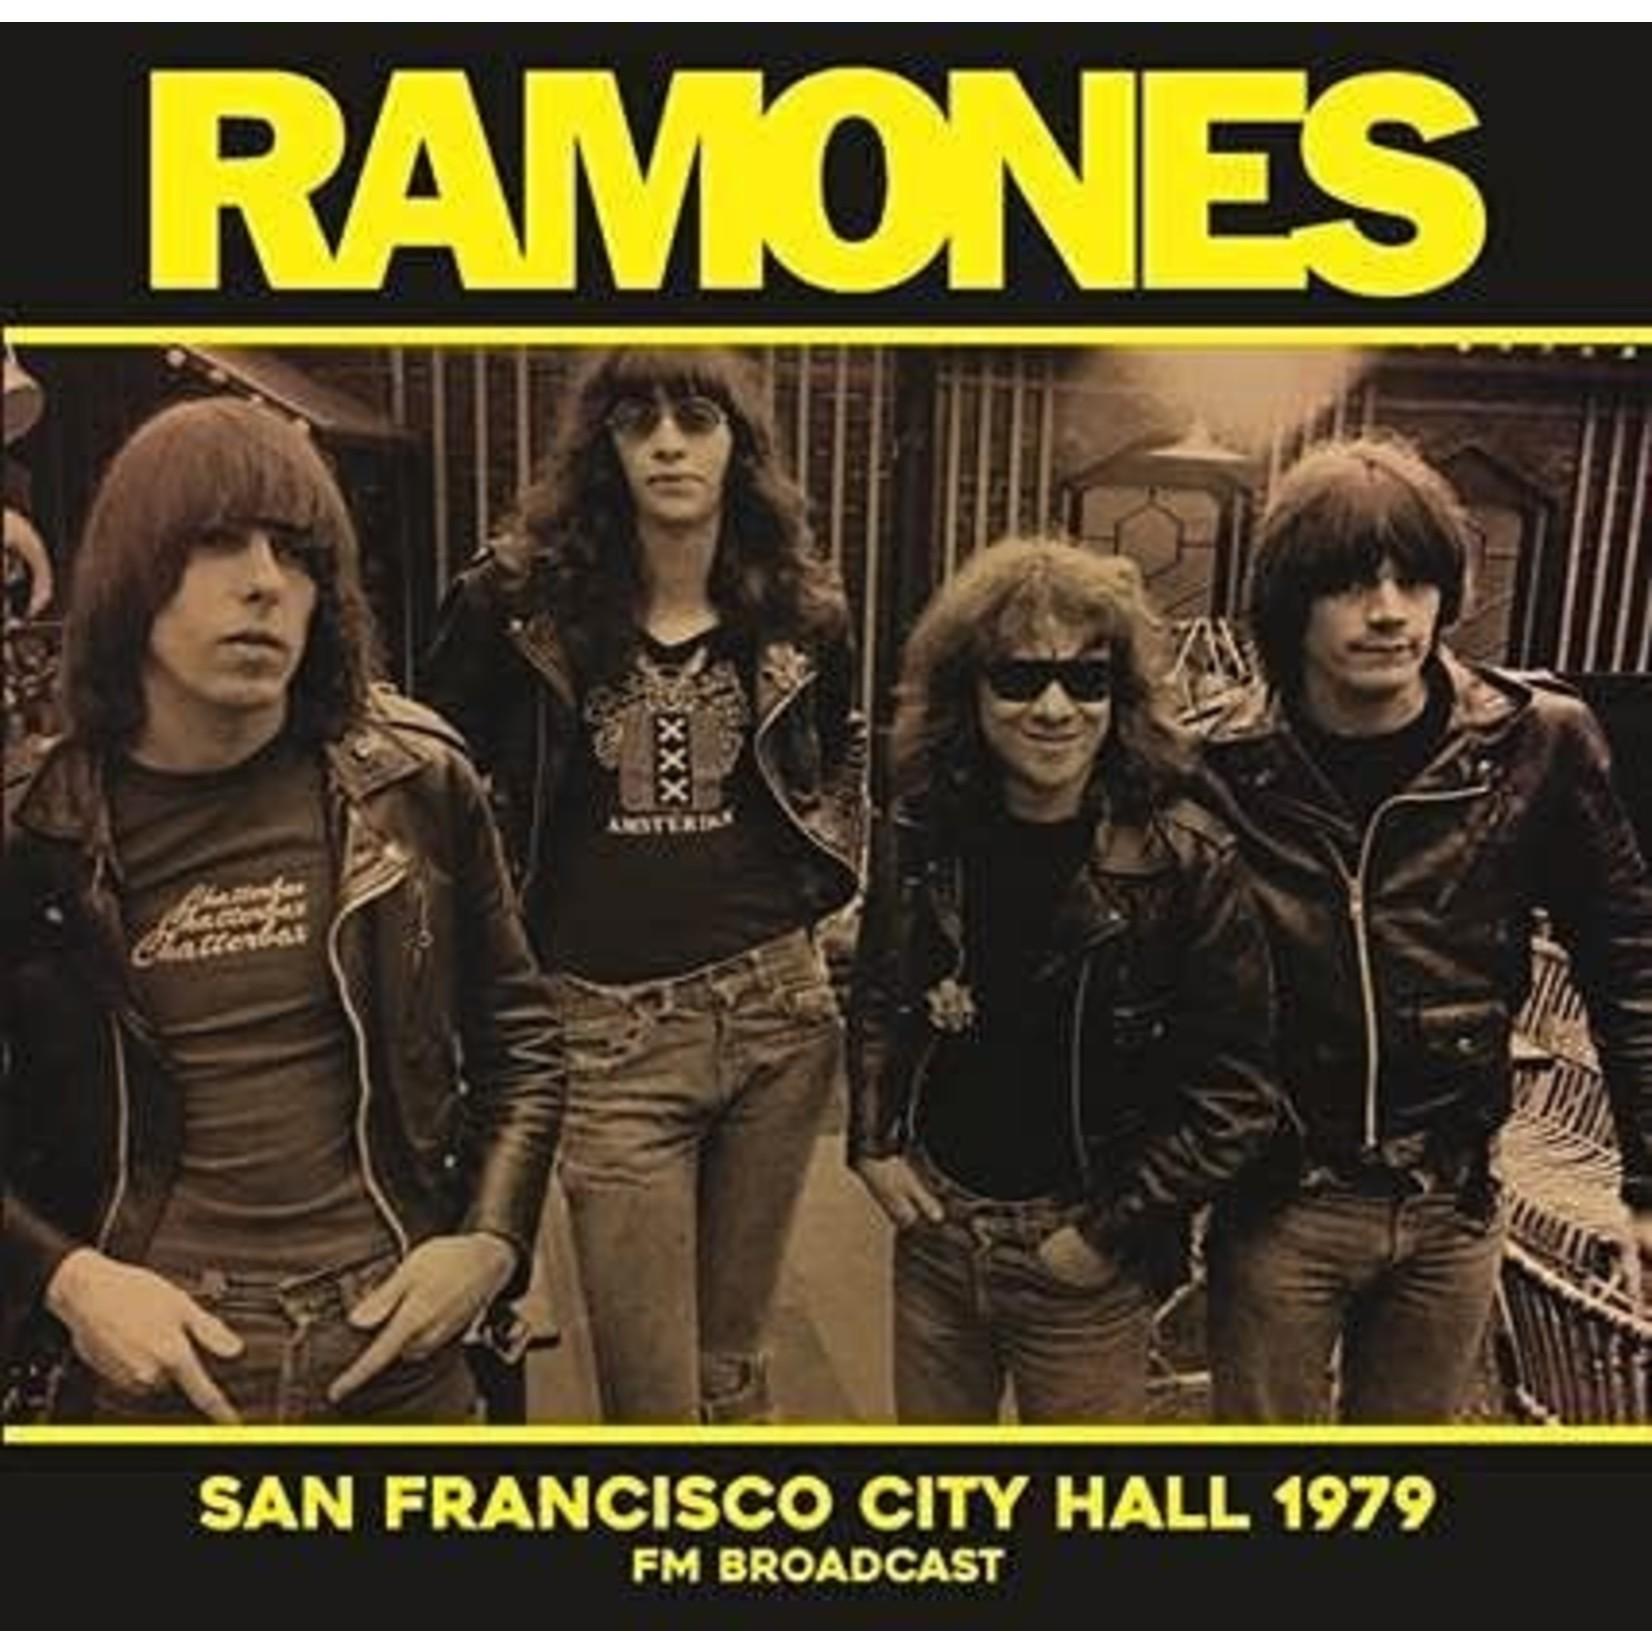 RAMONES SAN FRANCISCO CITY HALL 1979 FM BROADCAST  LP